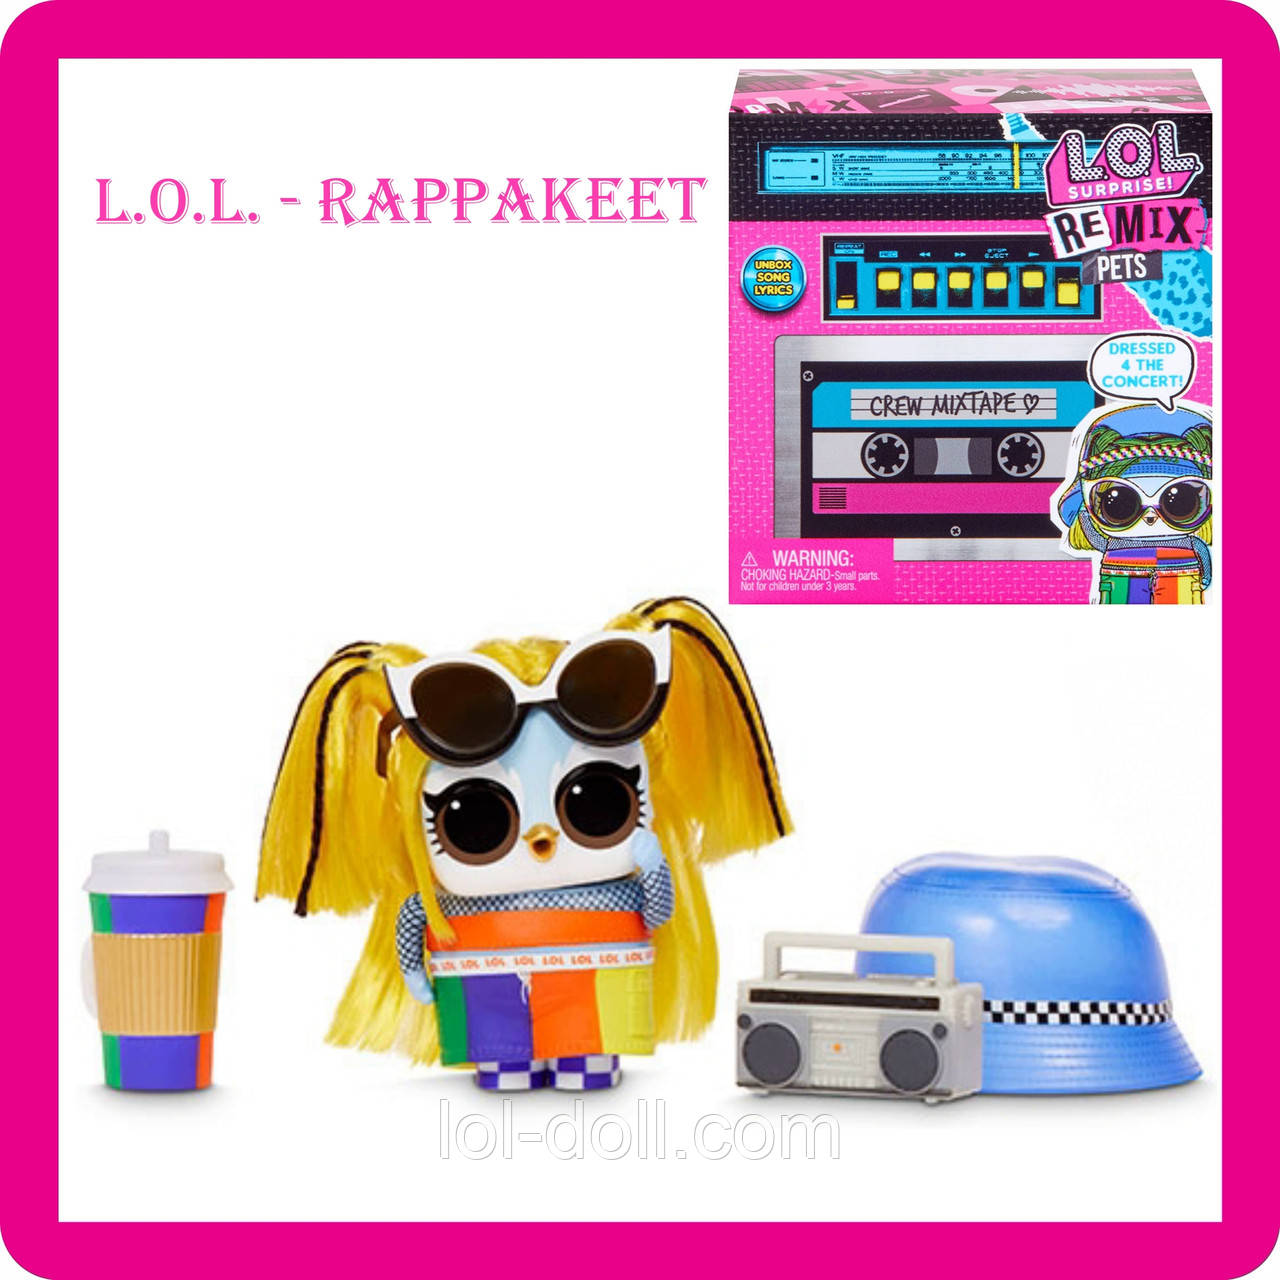 Кукла LOL Surprise Ремикс Петс Лол Сюрприз Оригинал Remix Pets - Rappakeet